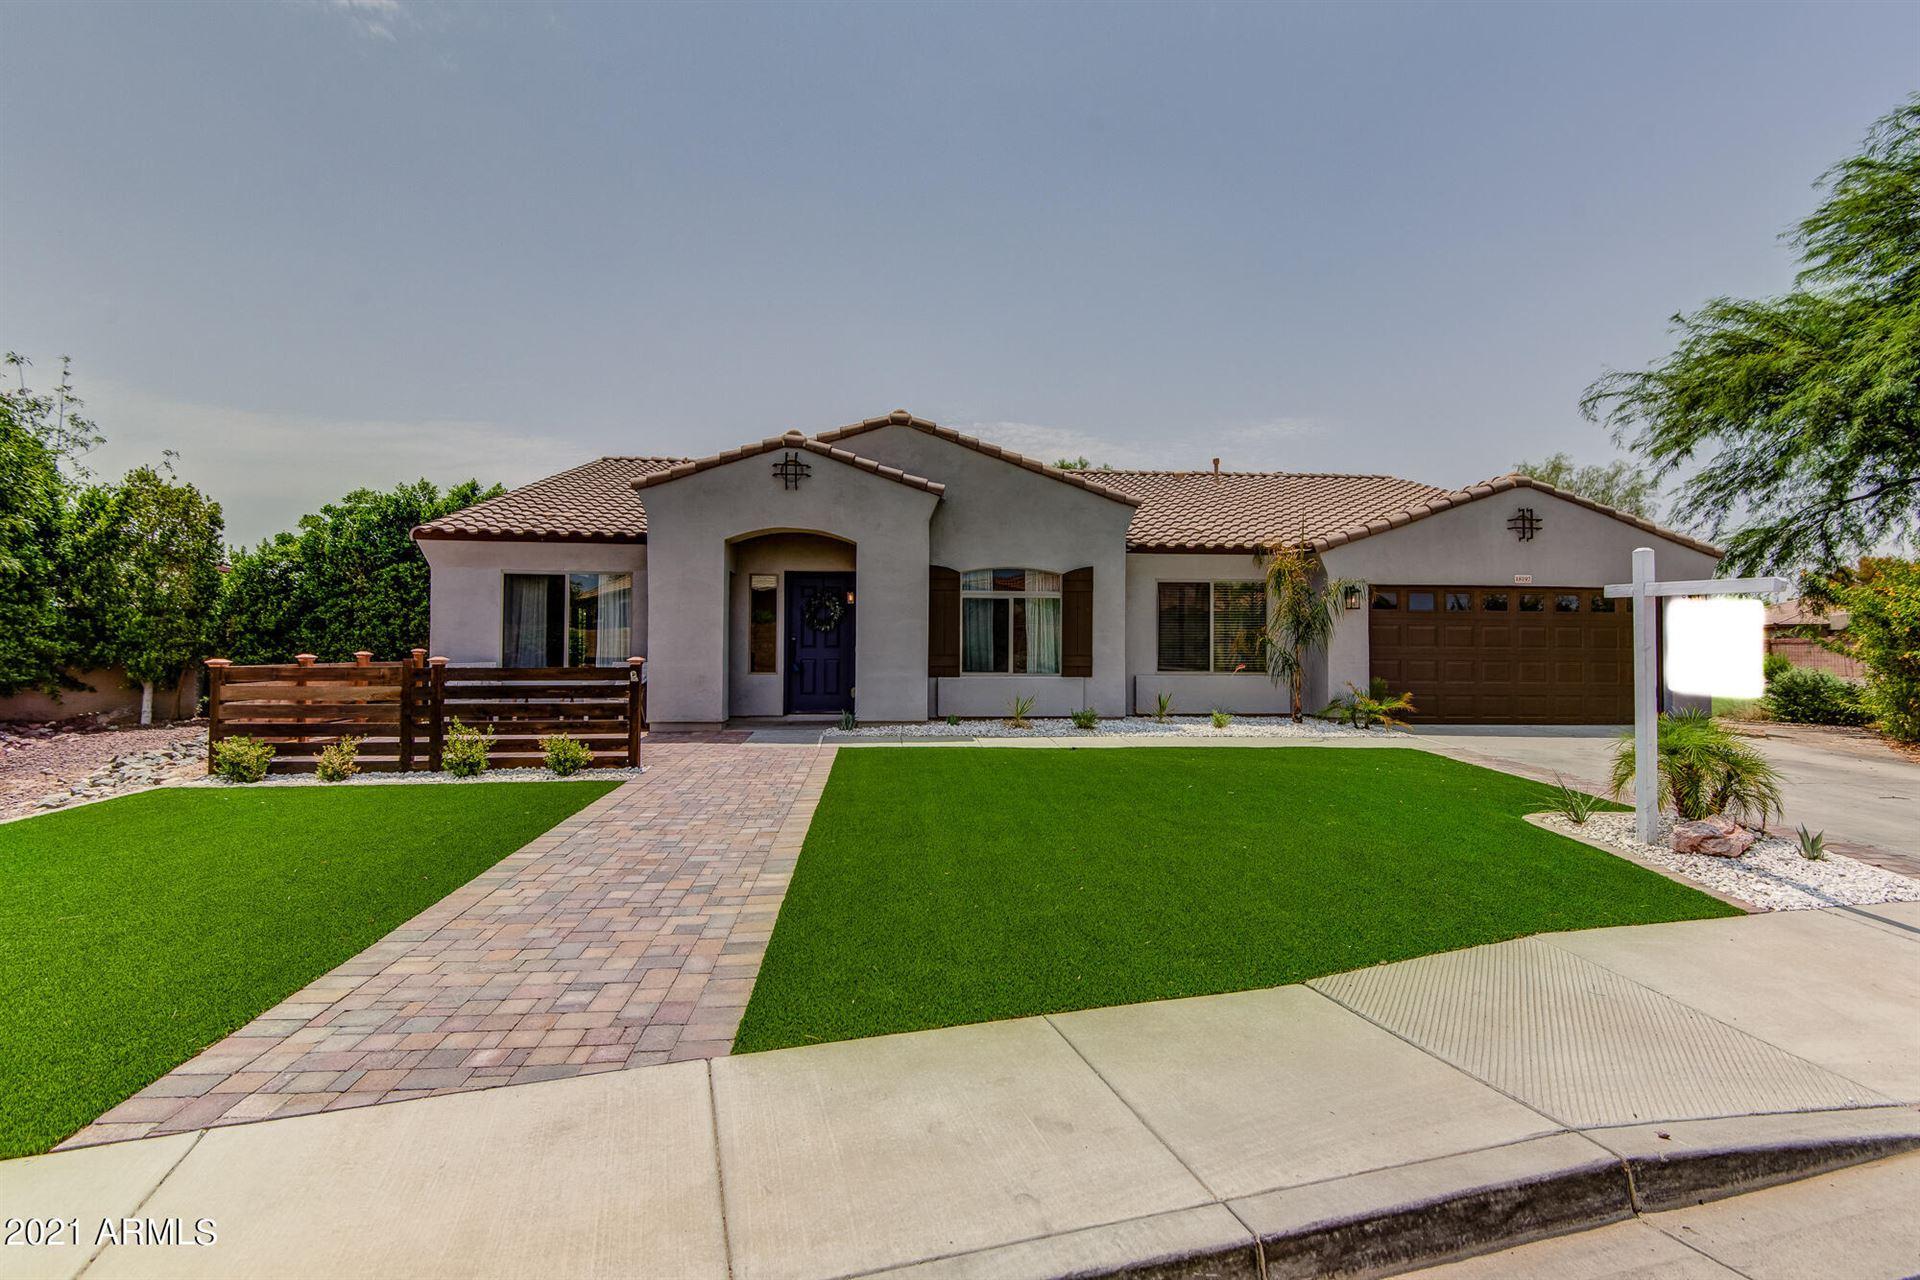 Photo of 18197 W WOODROW Lane, Surprise, AZ 85388 (MLS # 6268660)